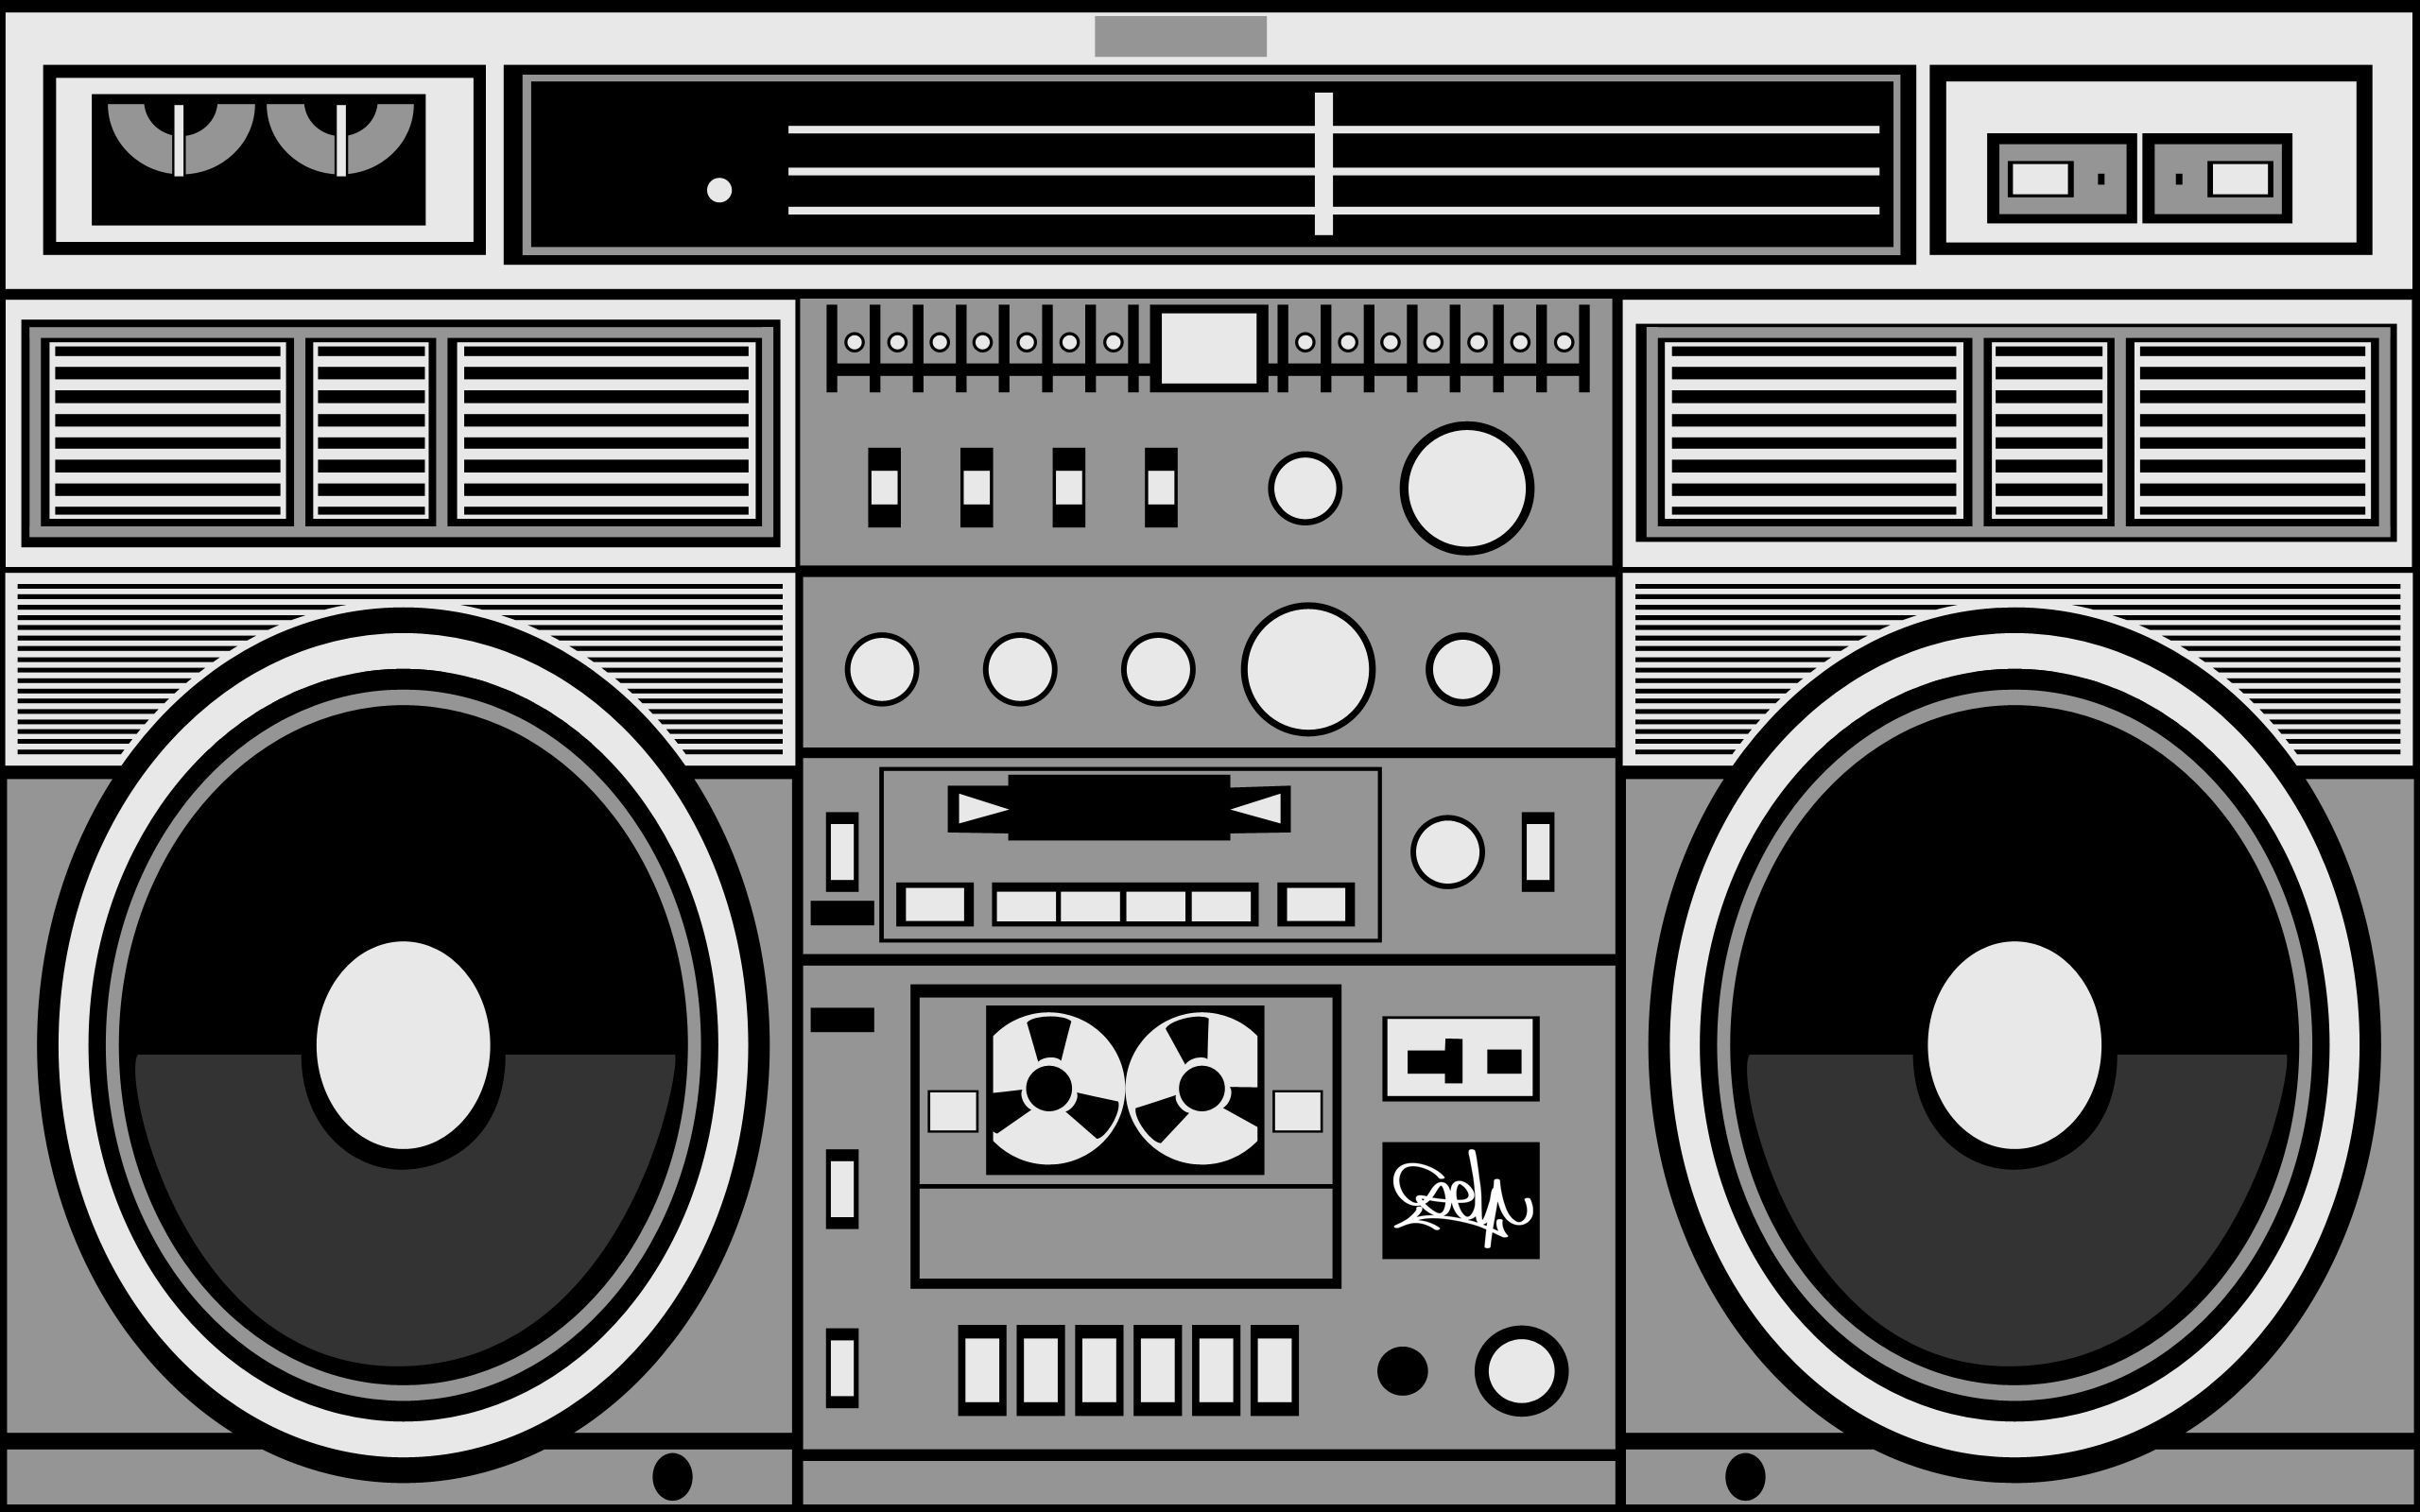 BEASTIE BOYS hip-hop hip hop rap radio stereo music wallpaper .